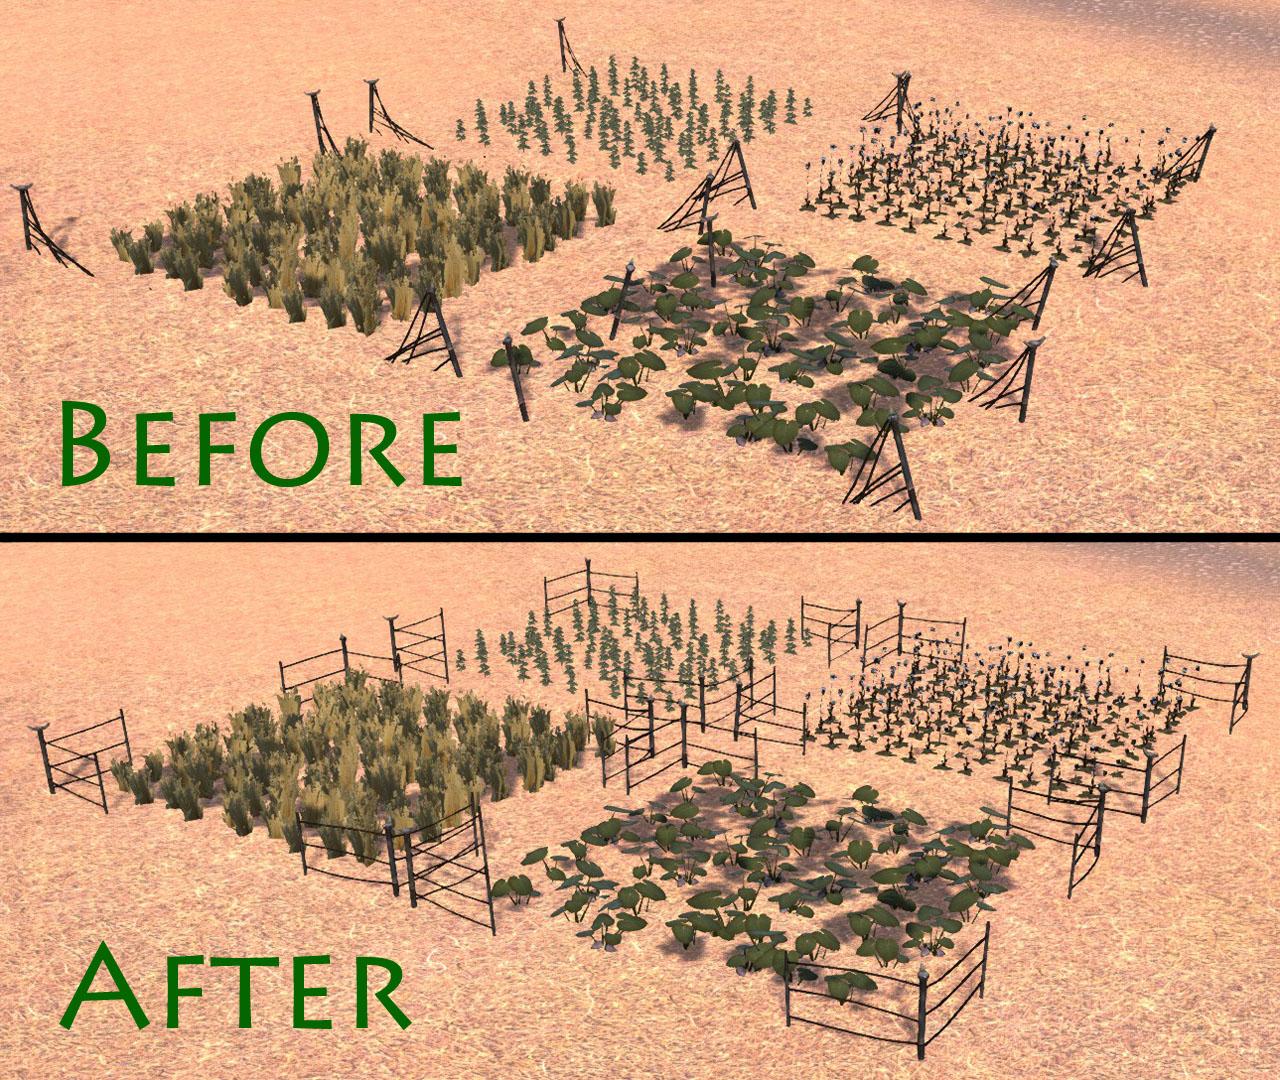 Little Better Farm Fences / Улучшенные заборы у грядок